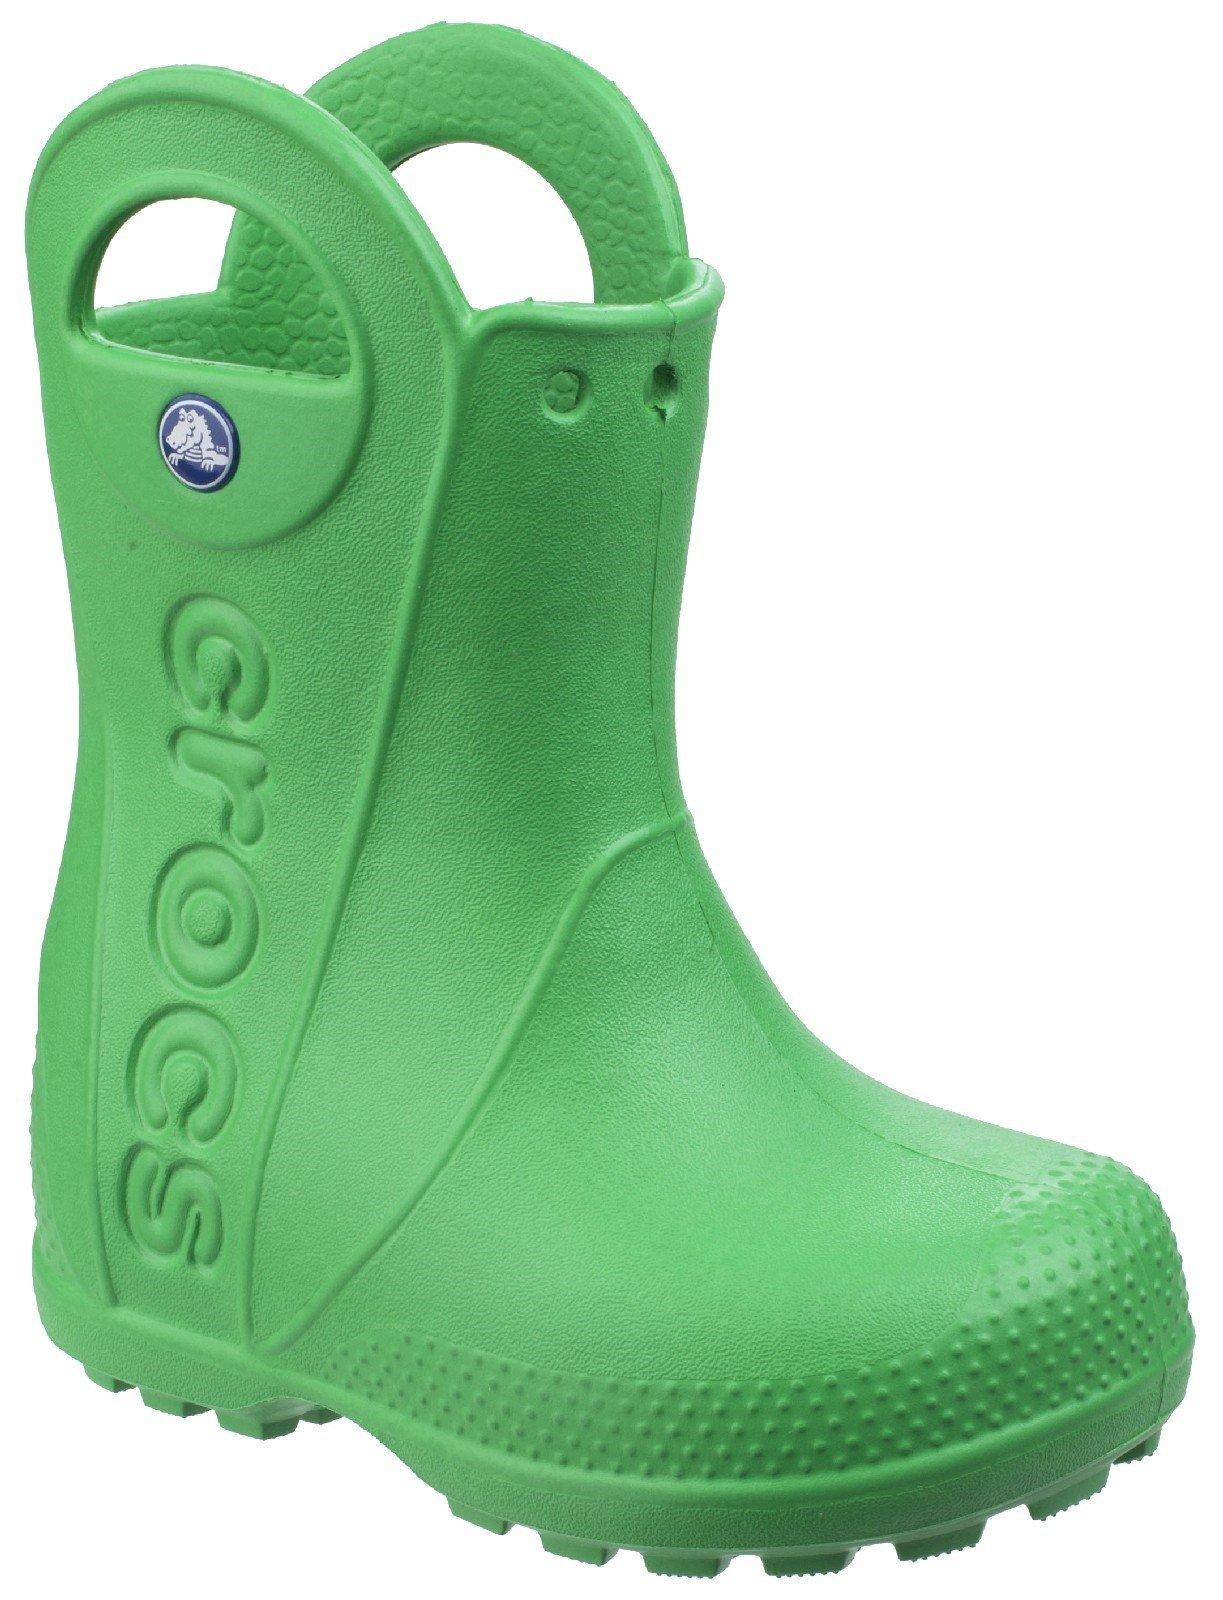 Crocs Kid's Rain Boot Various Colours 21080 - Grass Green 6 UK